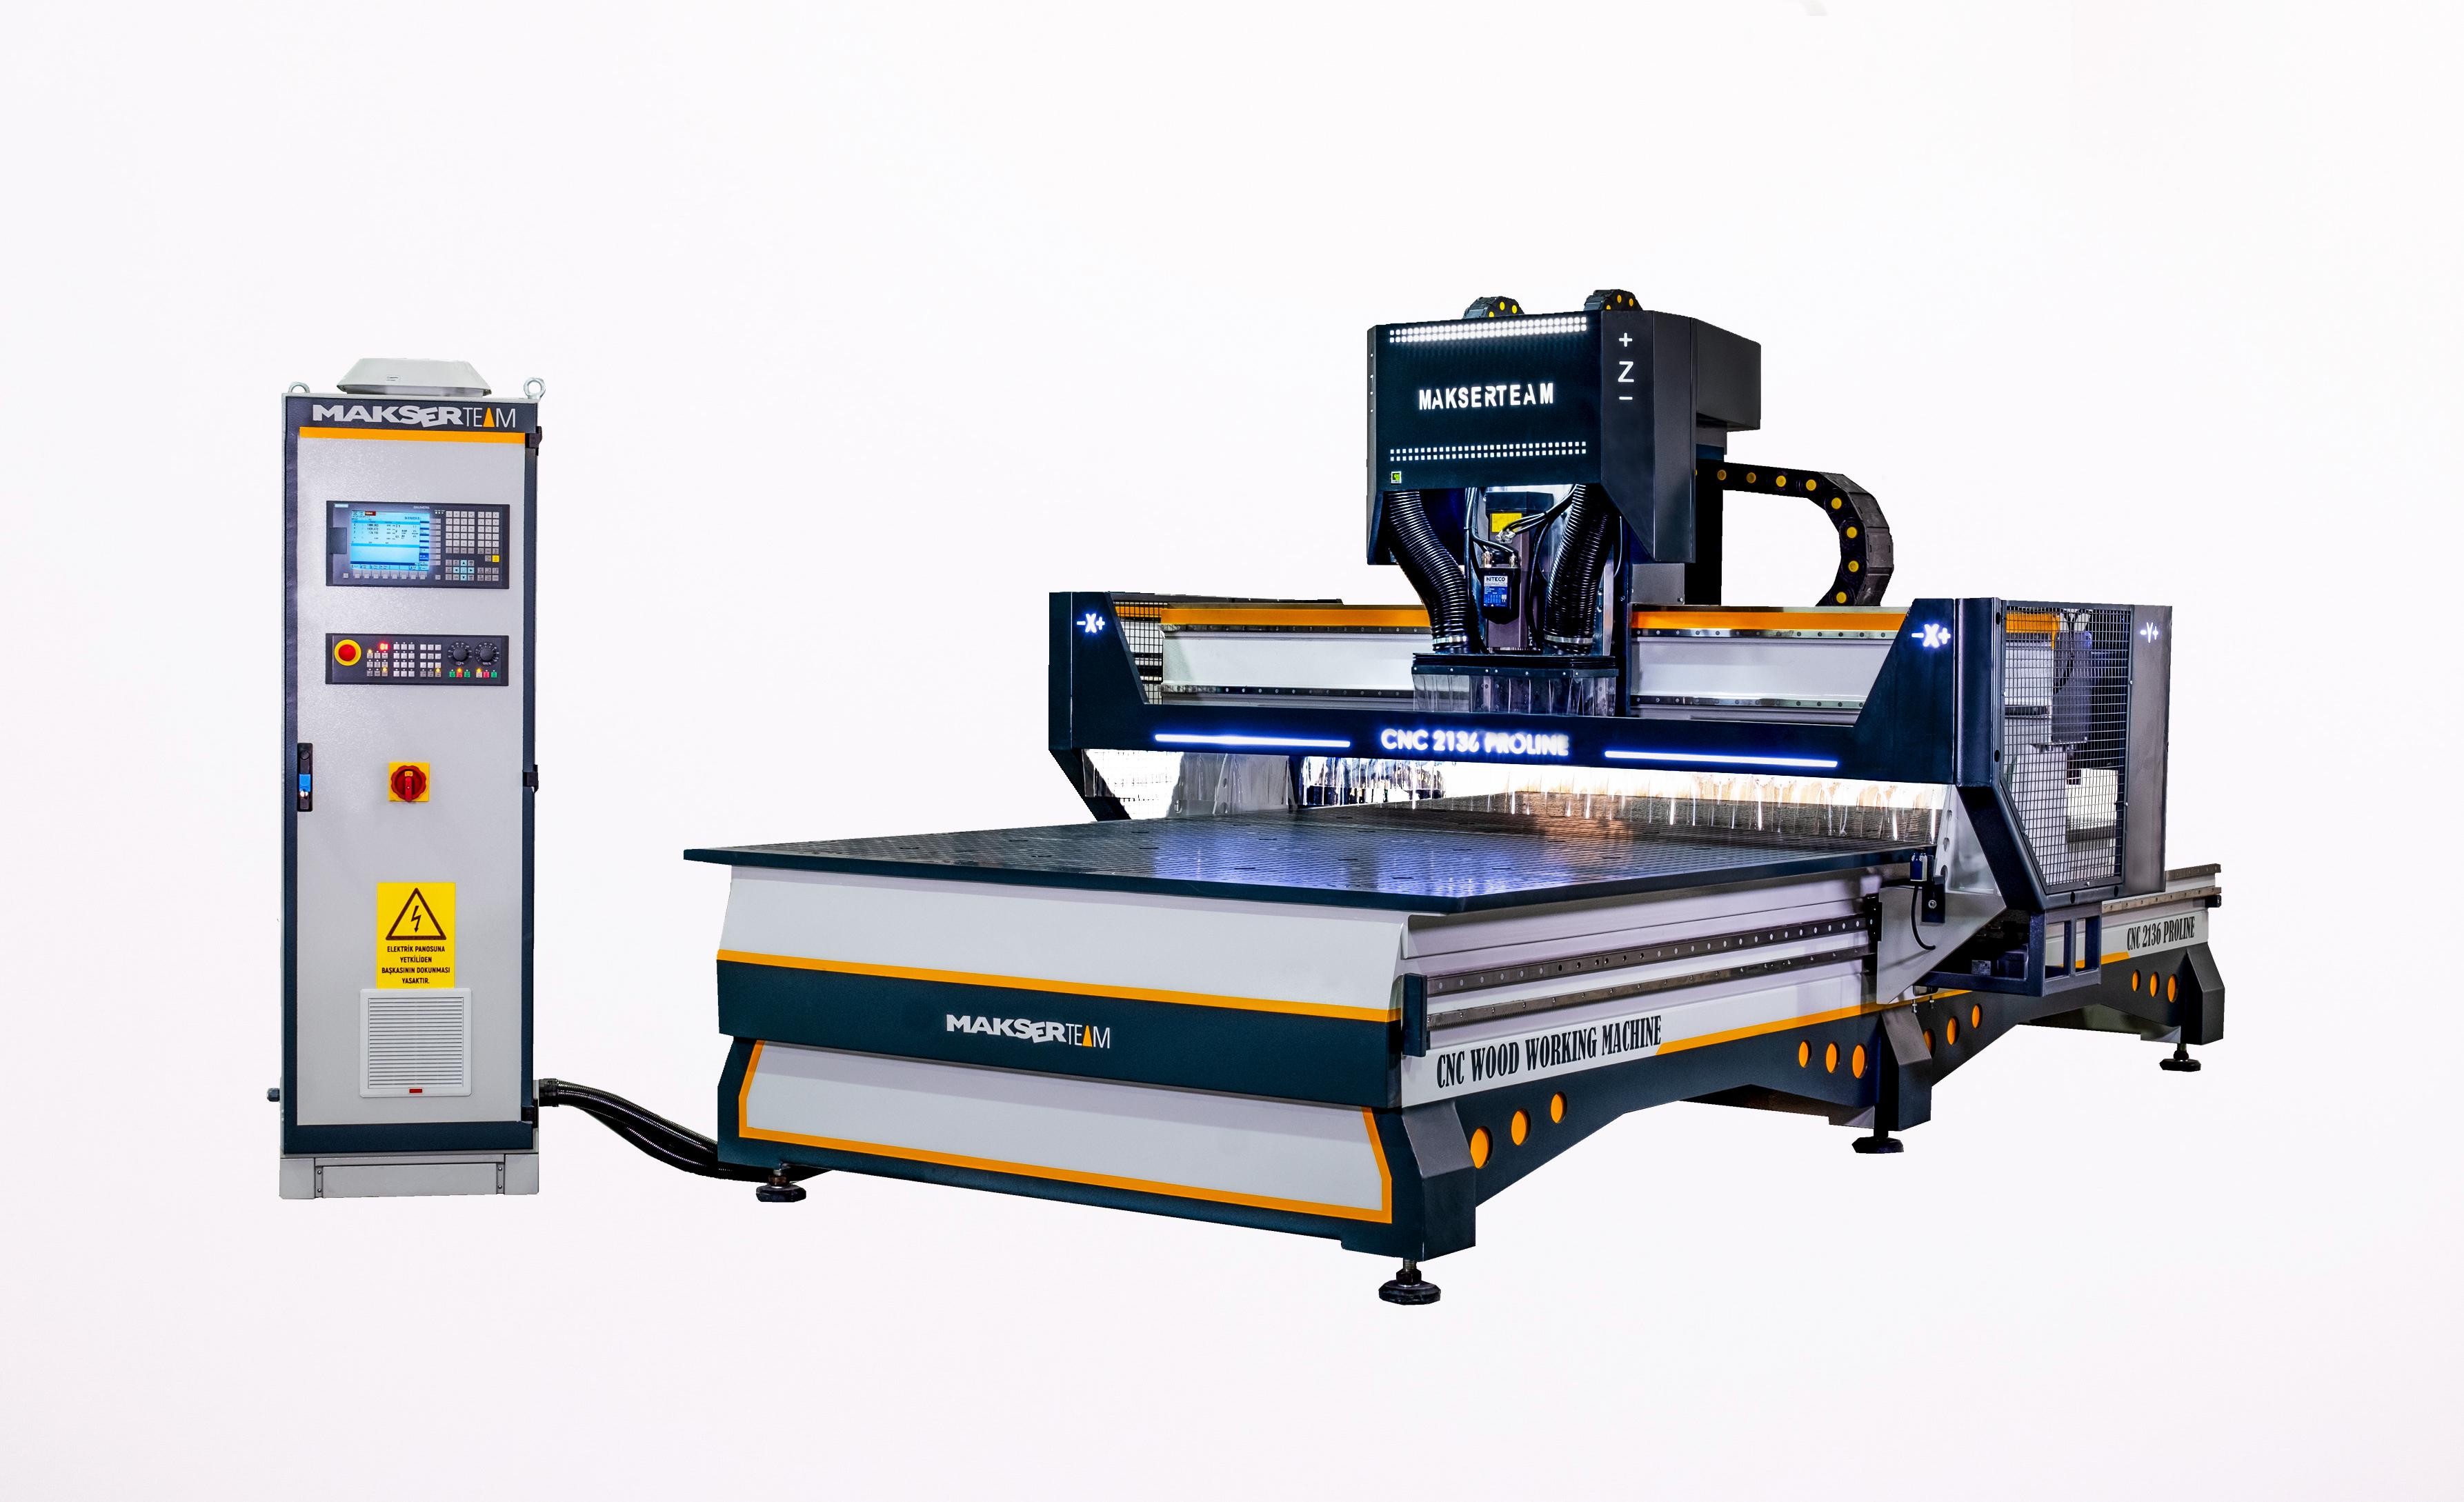 CNC 2136 PRO SIEMENS EDITION CNC Woodworking Machine 2100x3660 8 area vacuum 8.5 12 KW spindle